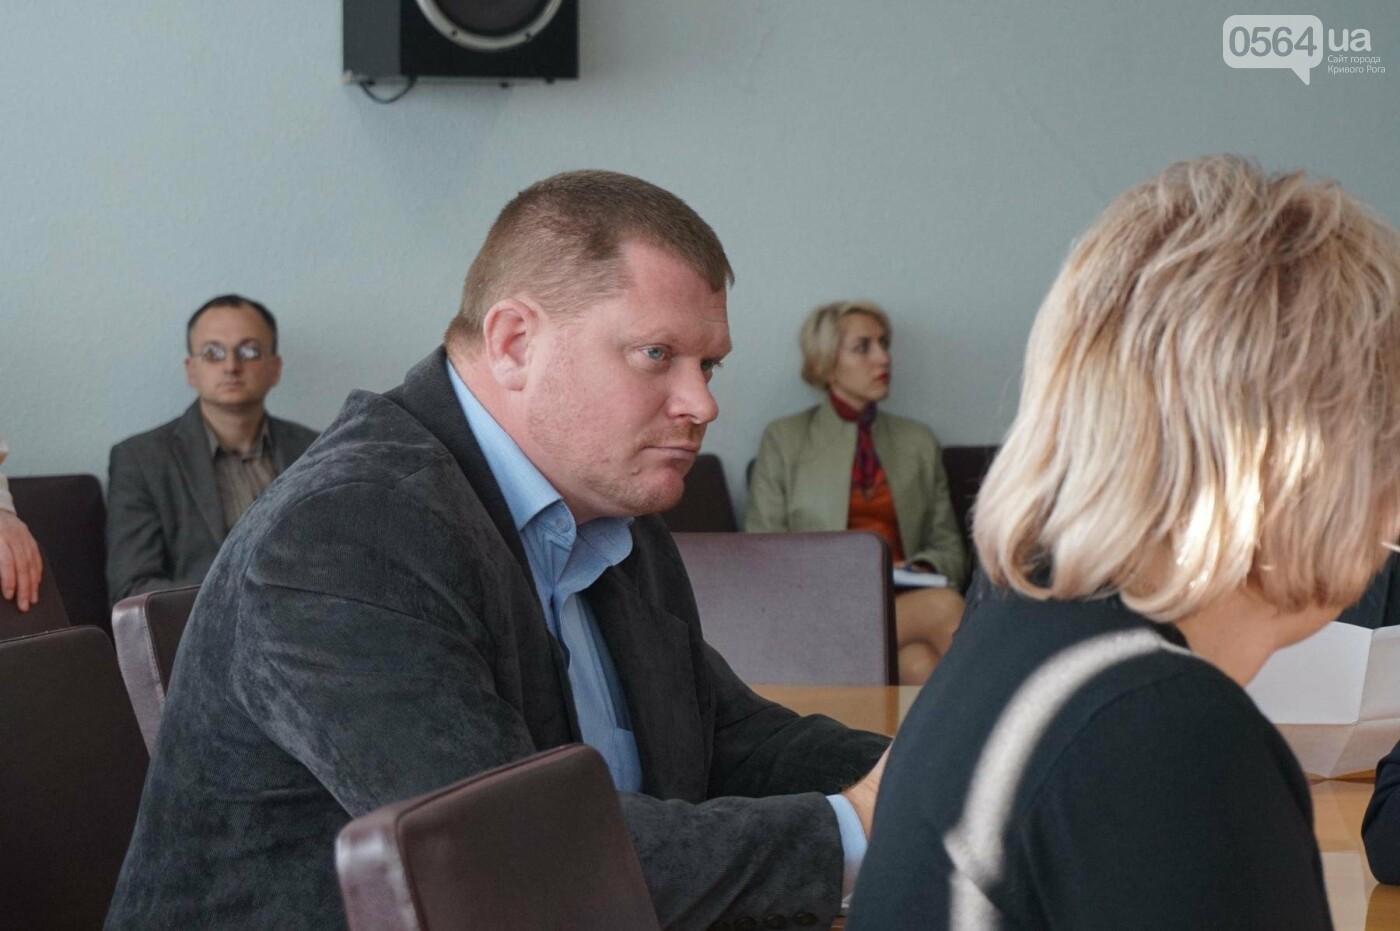 """Угадайте, кто будет крайним, если в -30 криворожанам отключат тепло!"": Юрий Вилкул призвал гасить долги за коммуналку (ФОТО), фото-7"